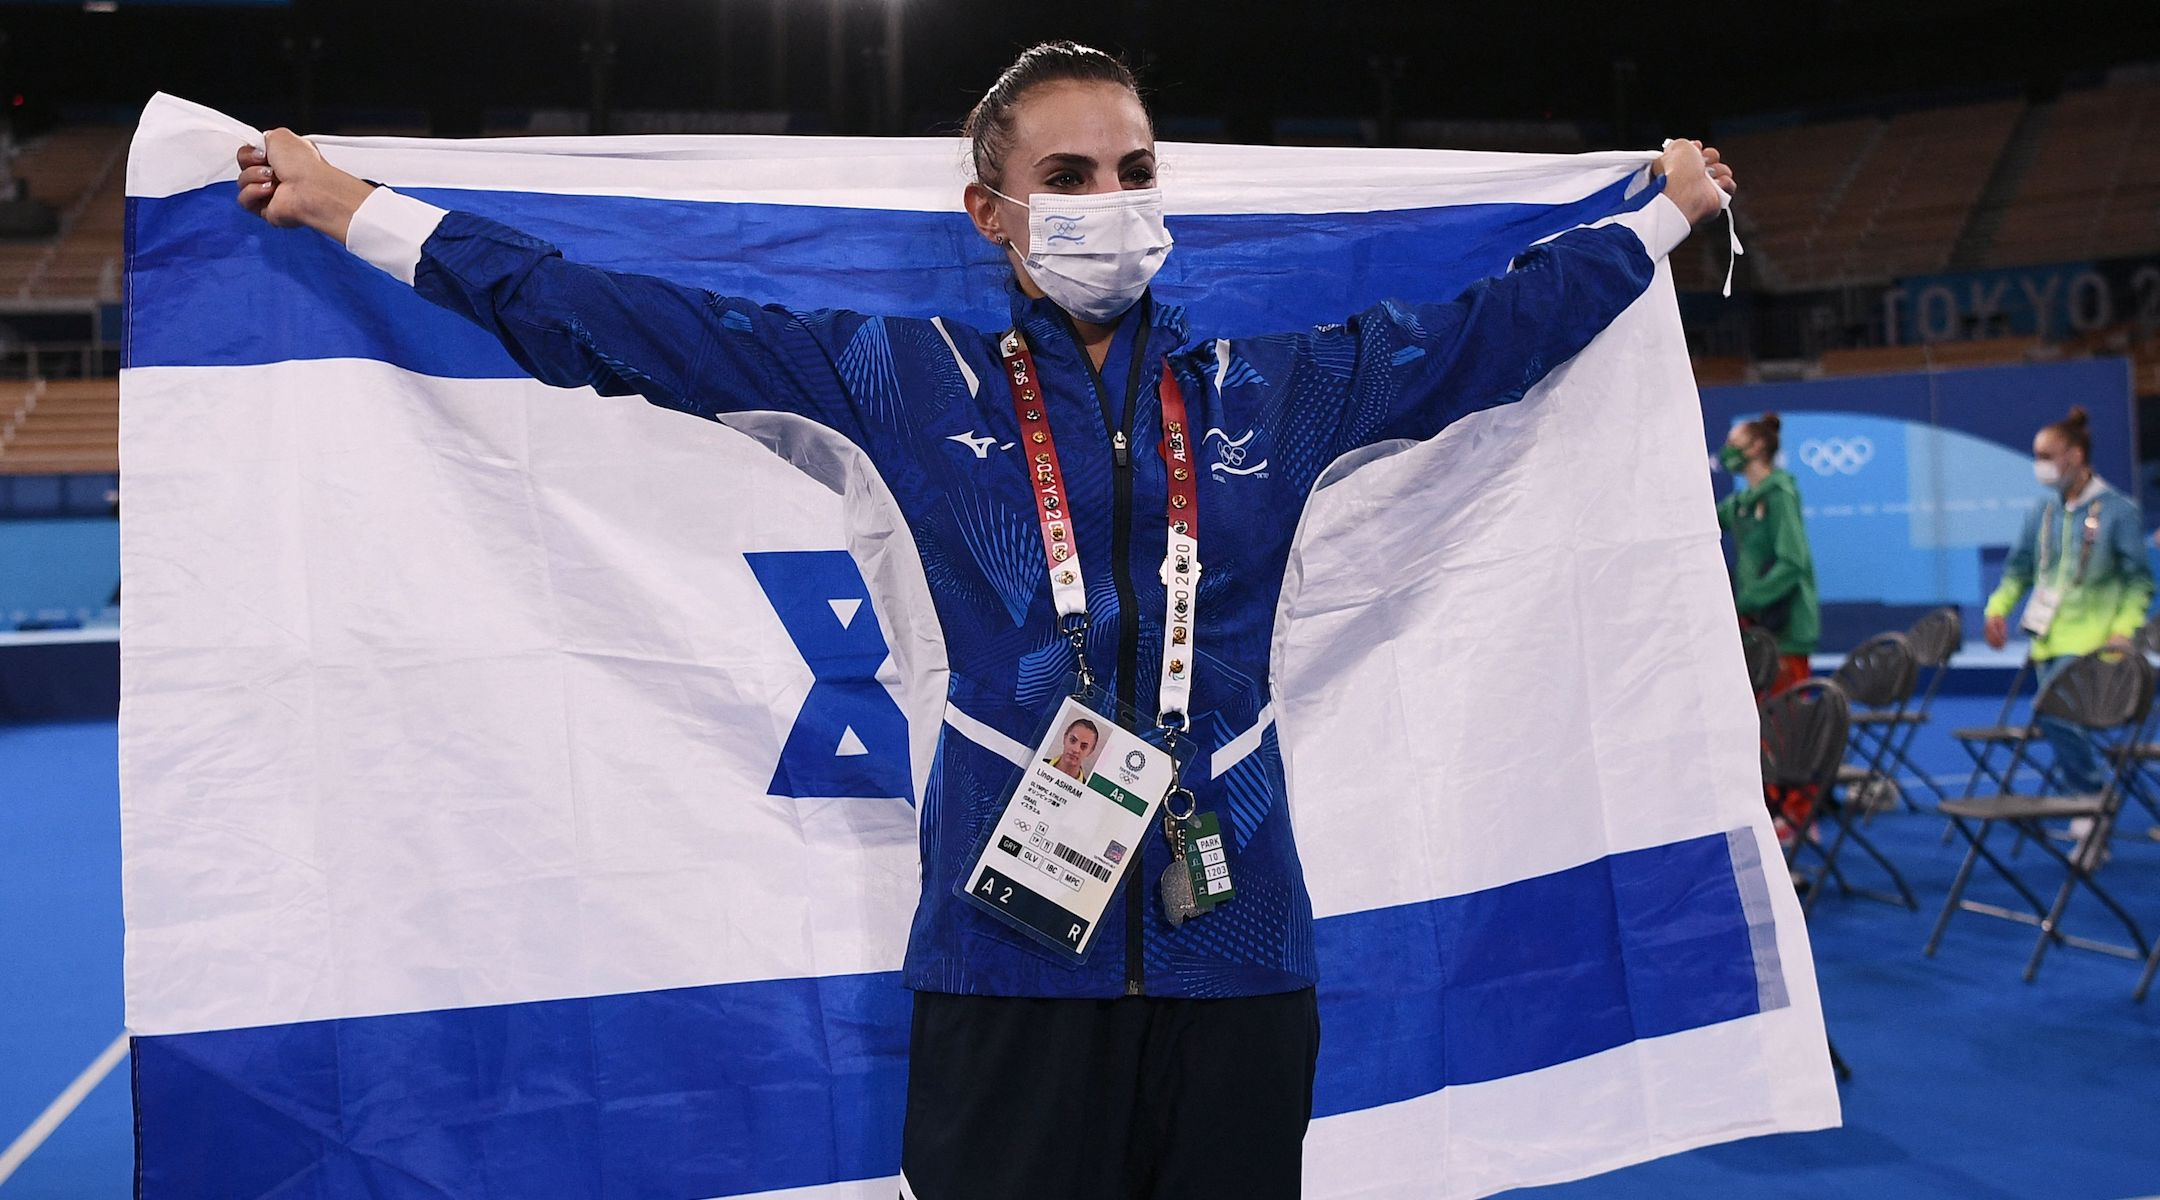 Linoy Ashram Israel Gold